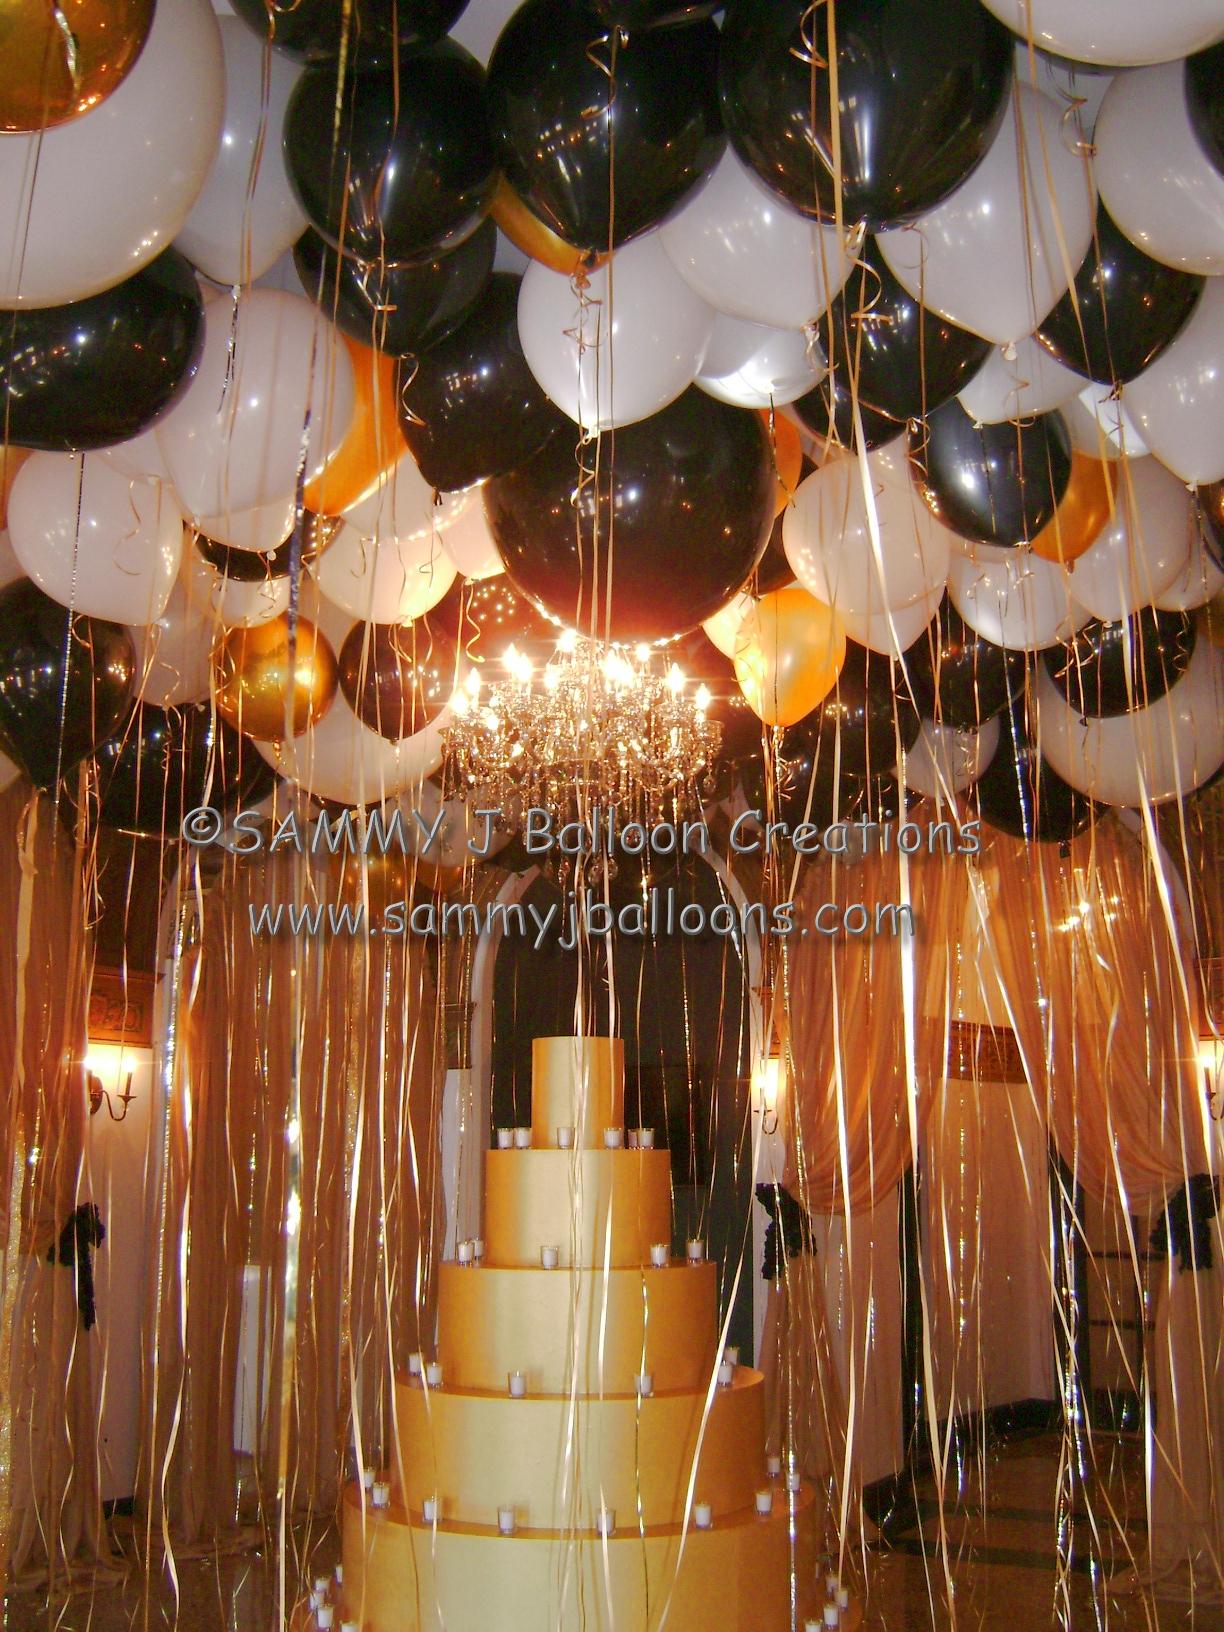 SAMMY J Balloon Creations st louis balloons ceiling canopy